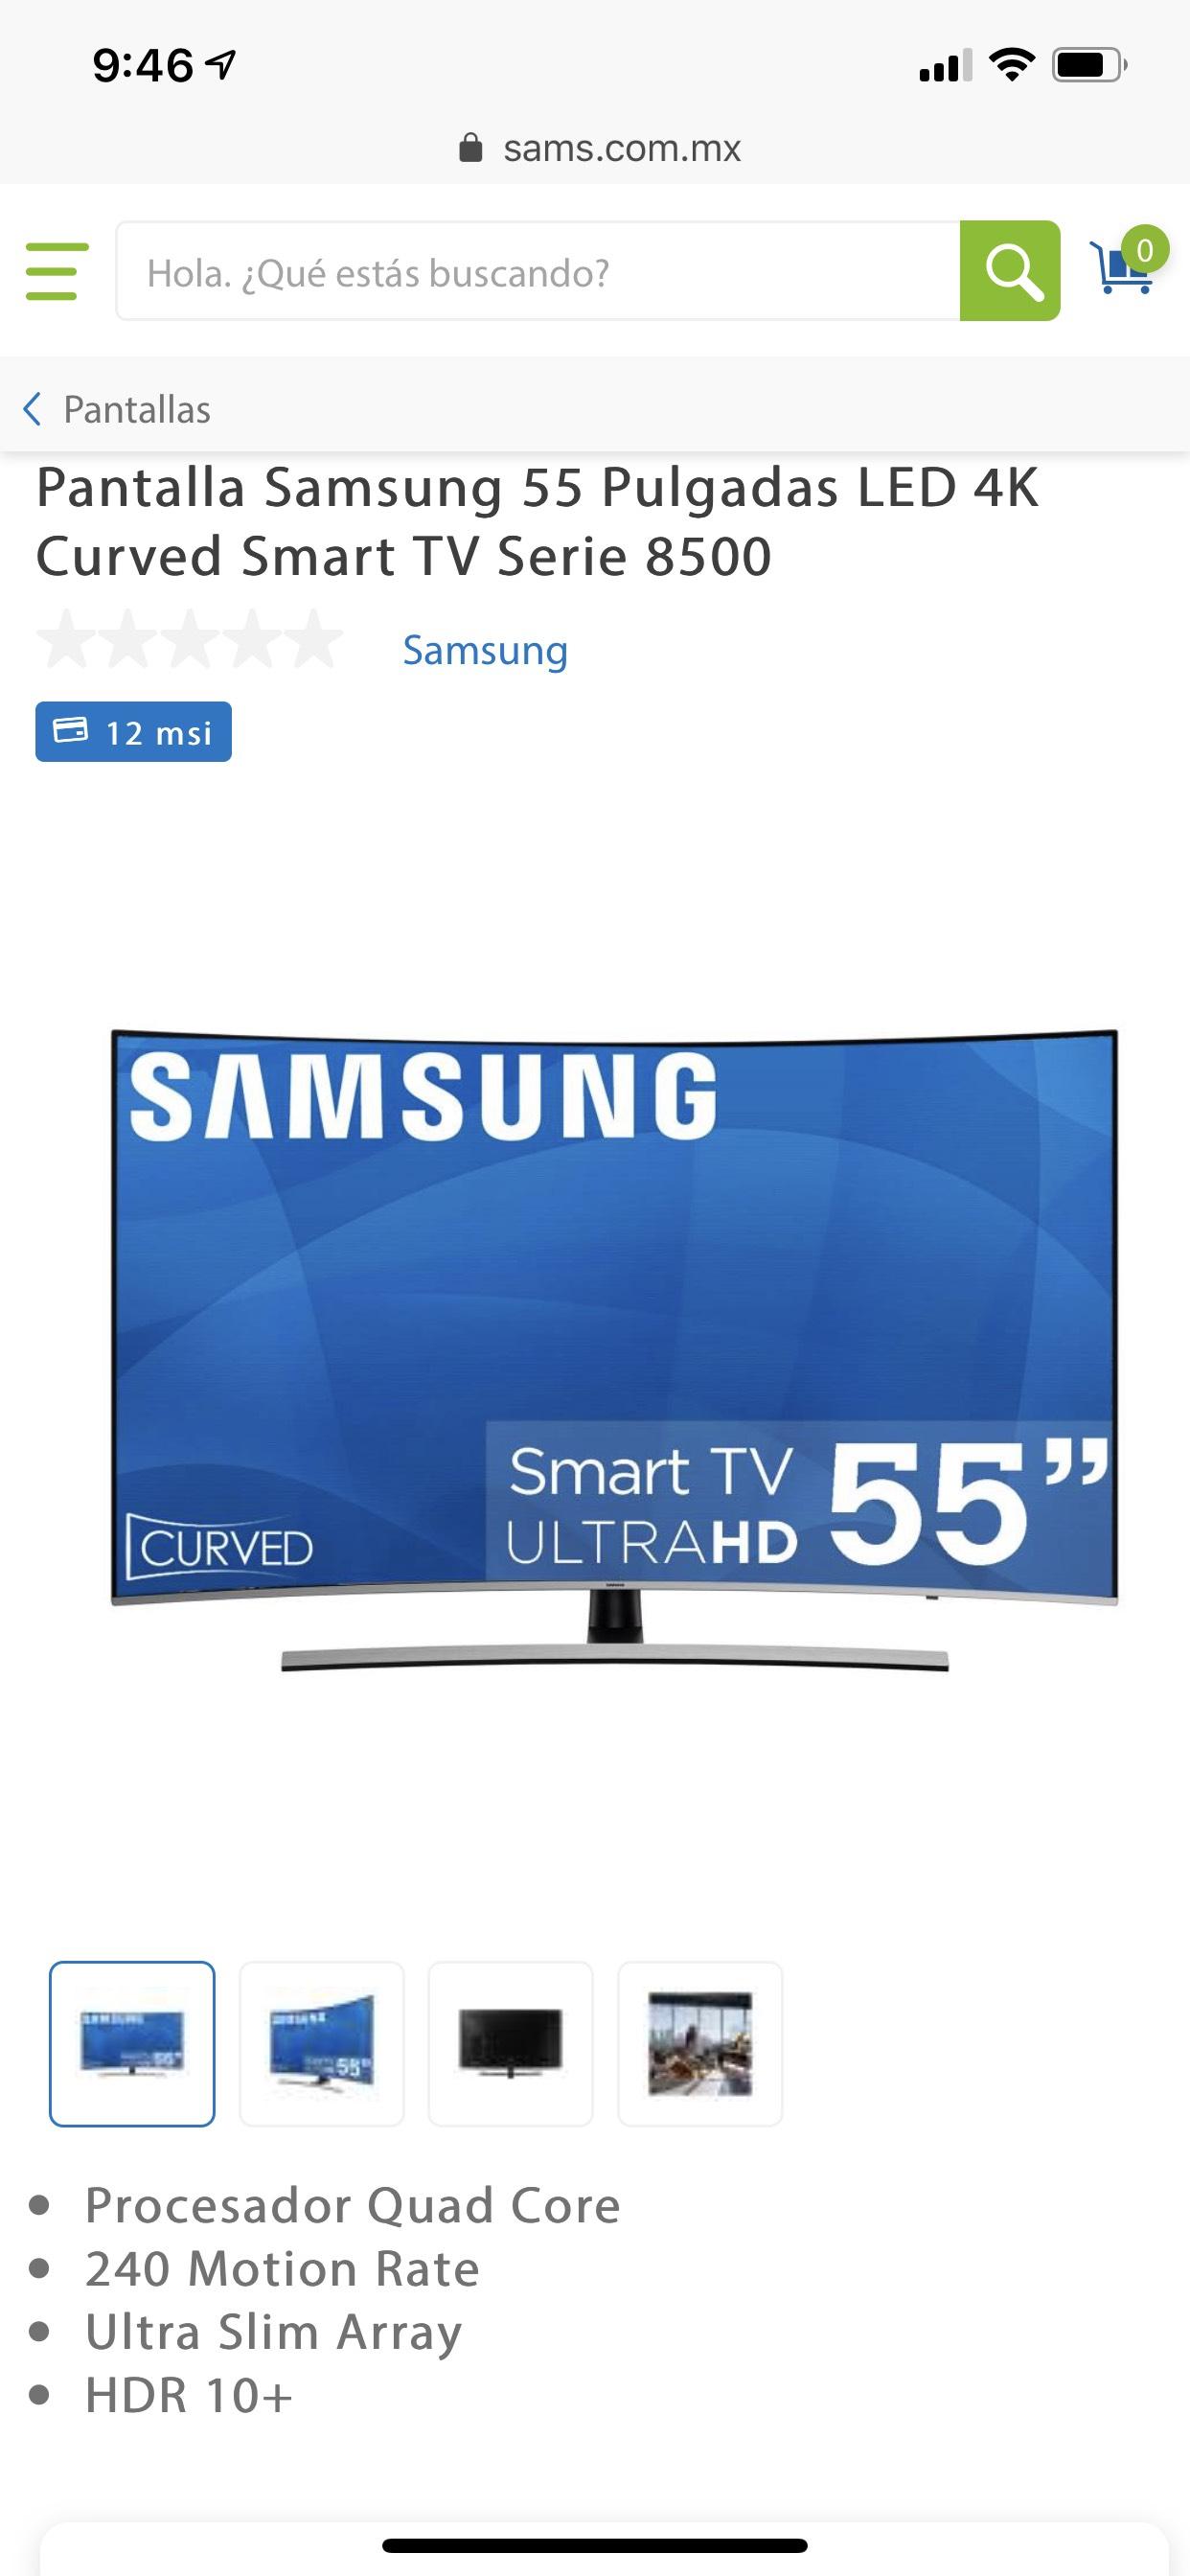 Sam's Club: Pantalla Samsung 55 Pulgadas LED 4K Curved Smart TV Serie 8500